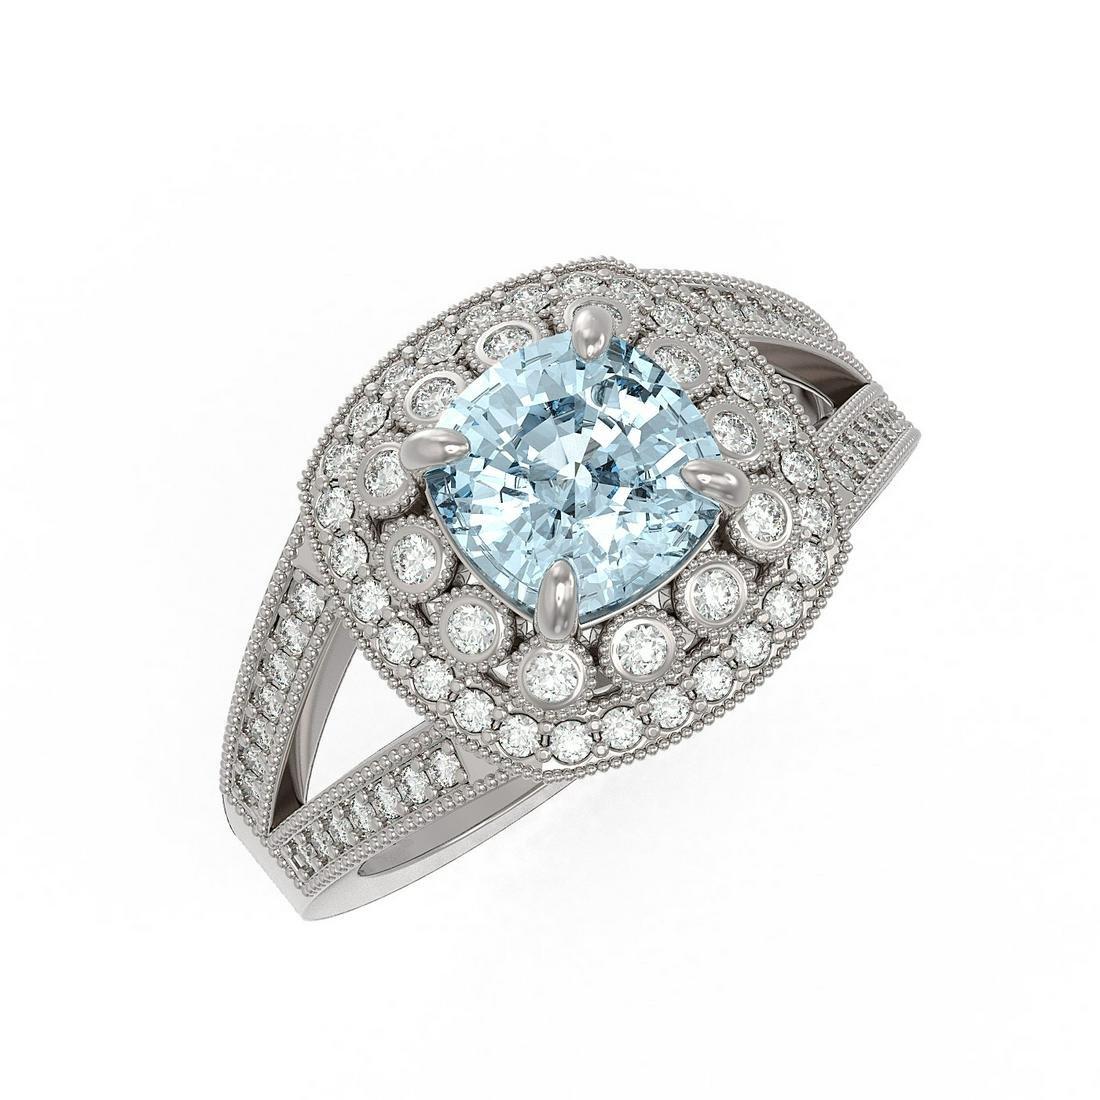 2.39 ctw Aquamarine & Diamond Ring 14K White Gold